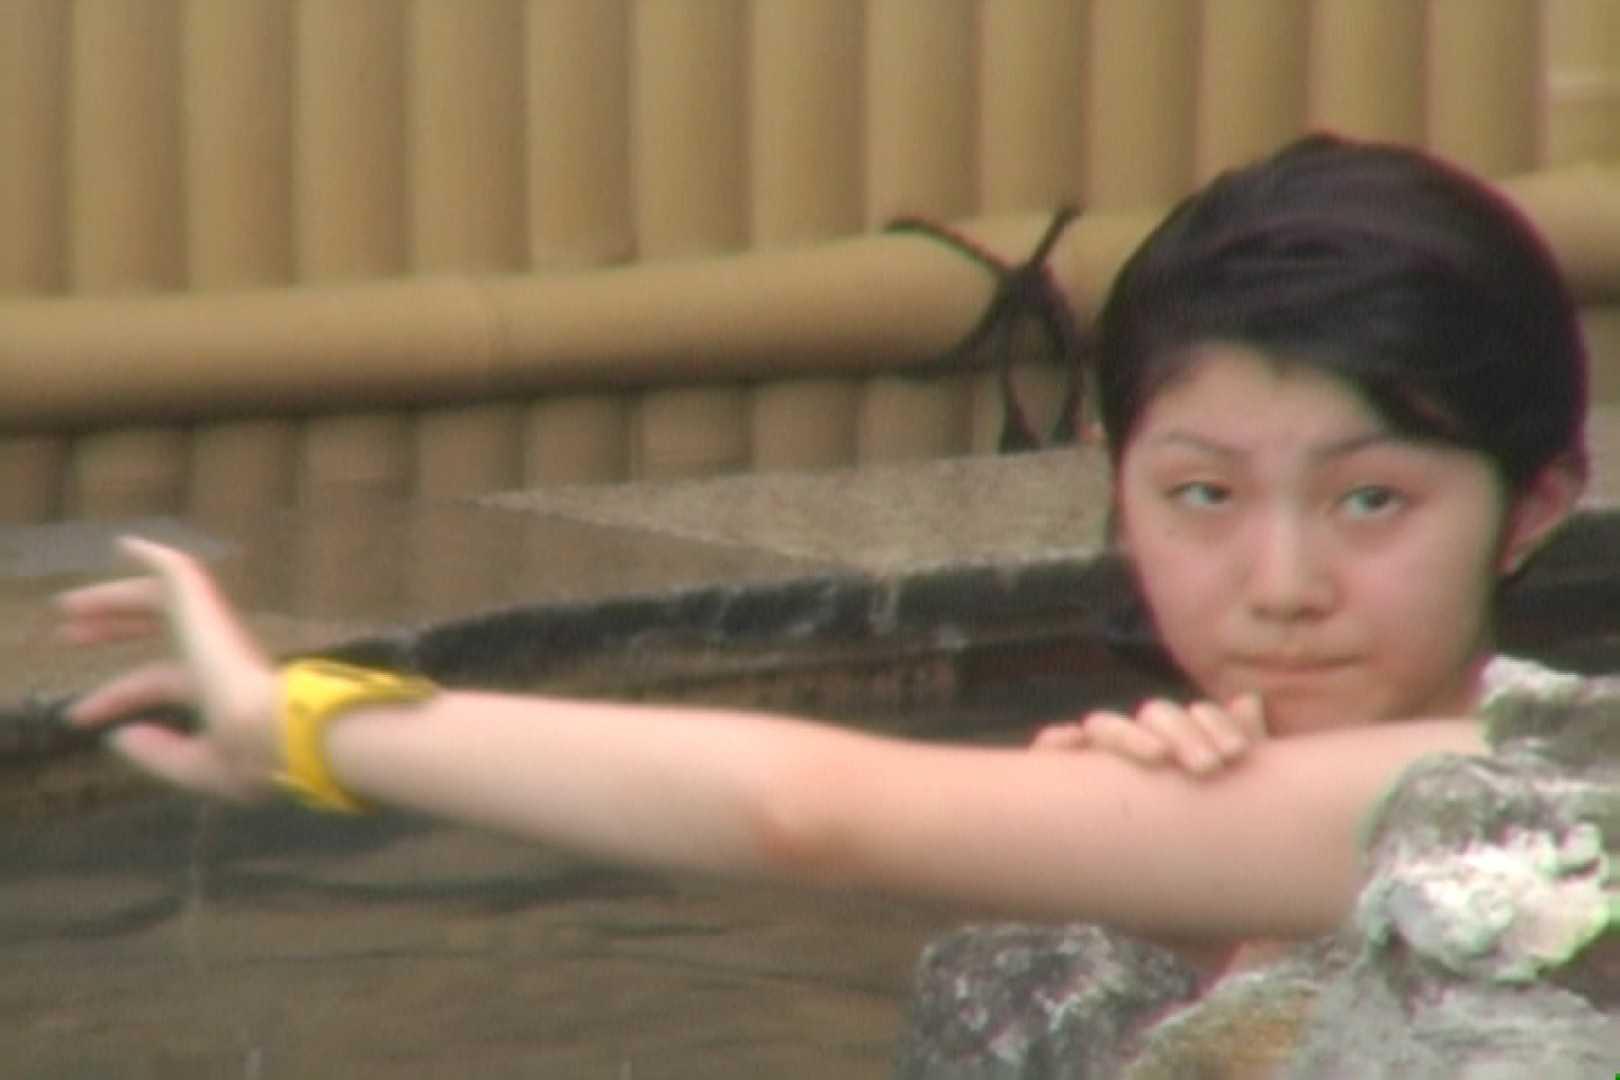 Aquaな露天風呂Vol.579 盗撮 隠し撮りオマンコ動画紹介 42PICs 8